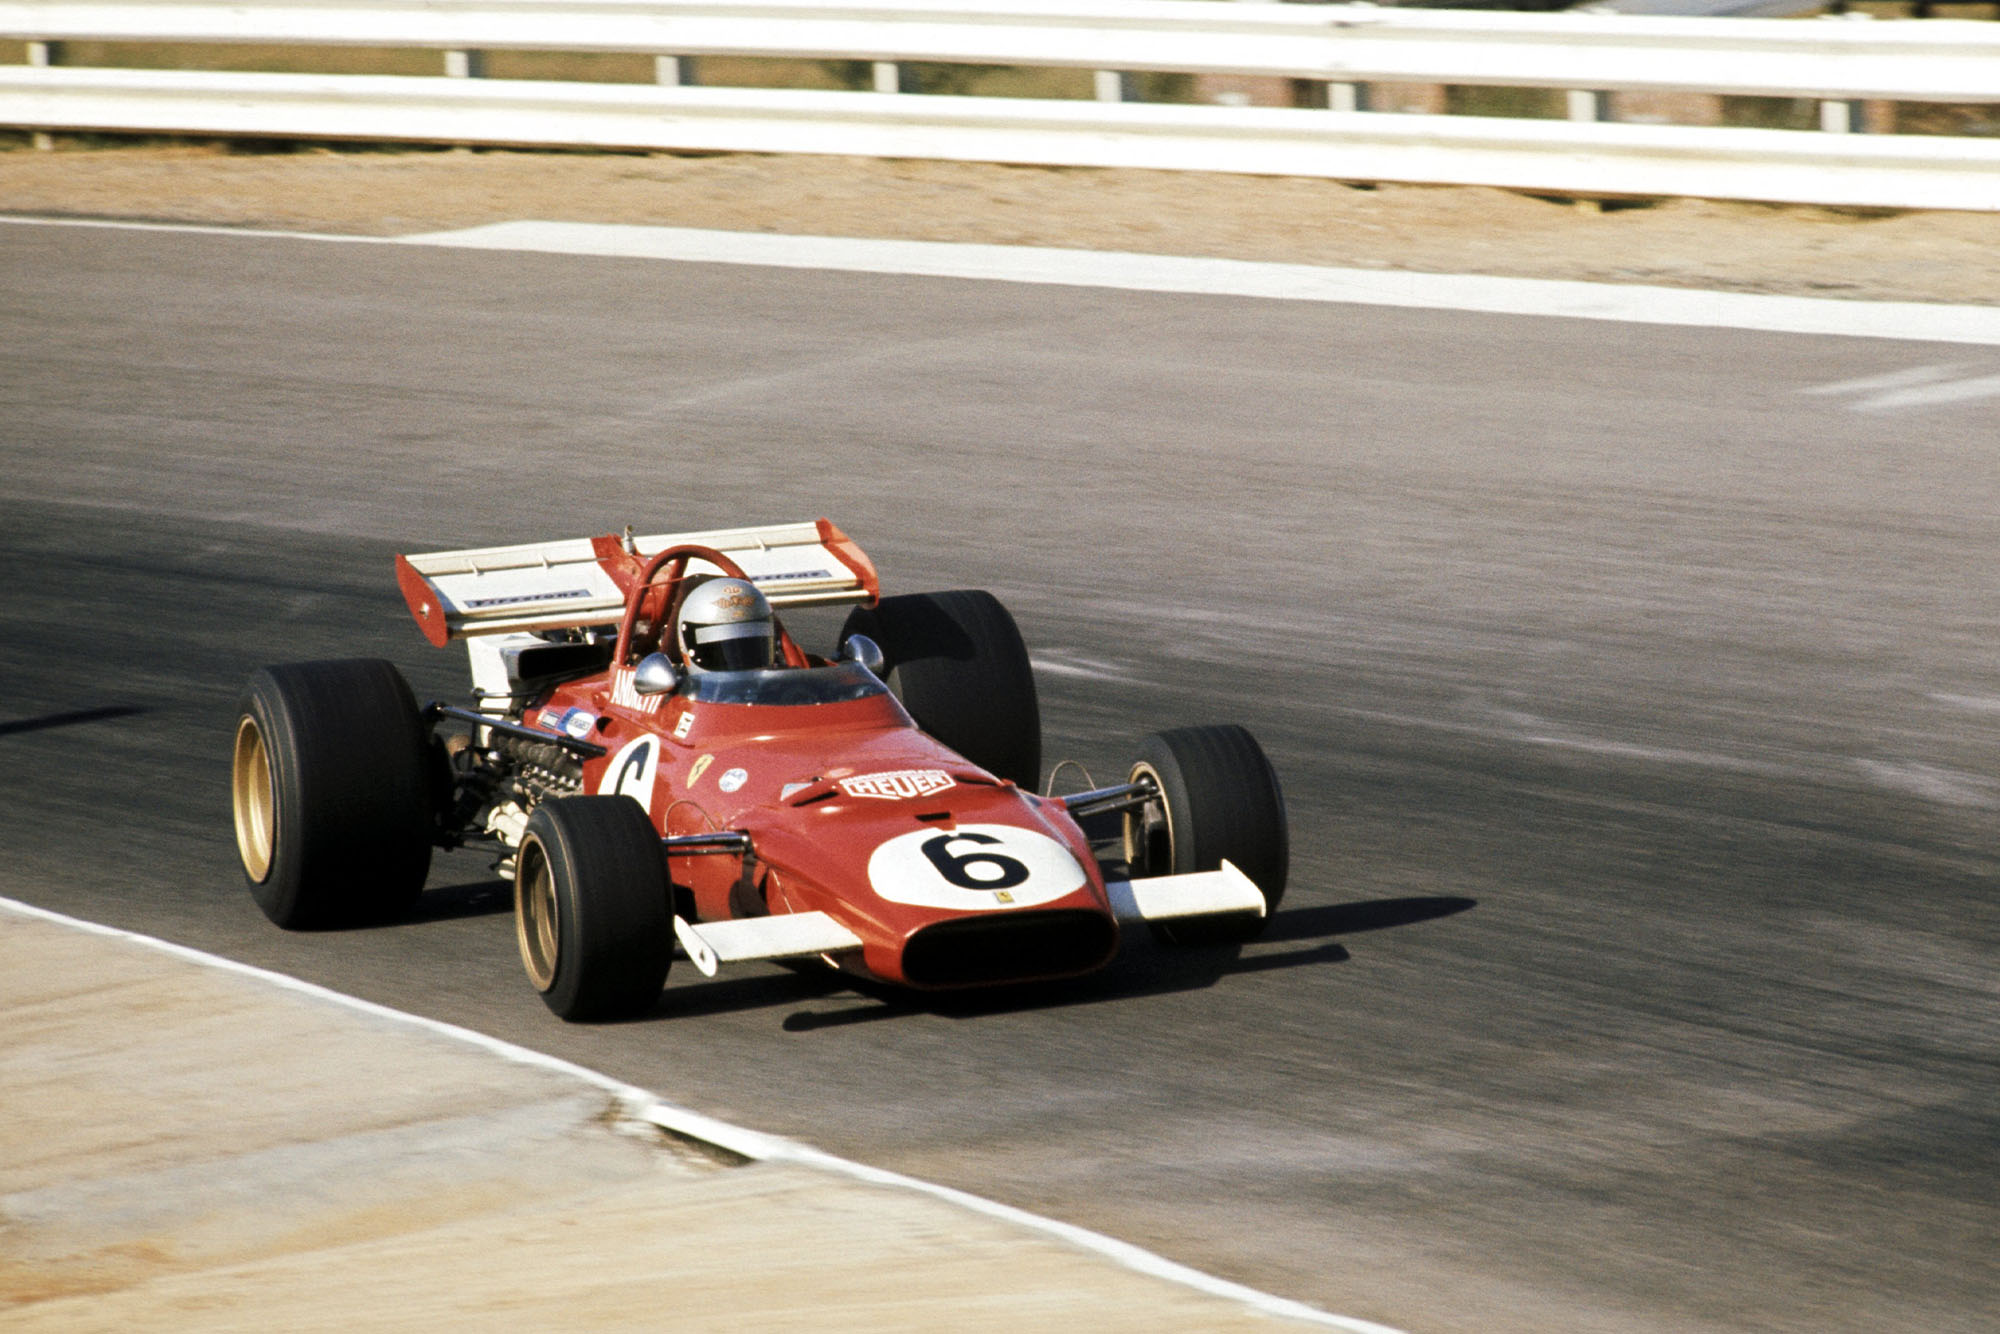 Mario Andretti driving for Ferrari at the 1971 South African Grand Prix.